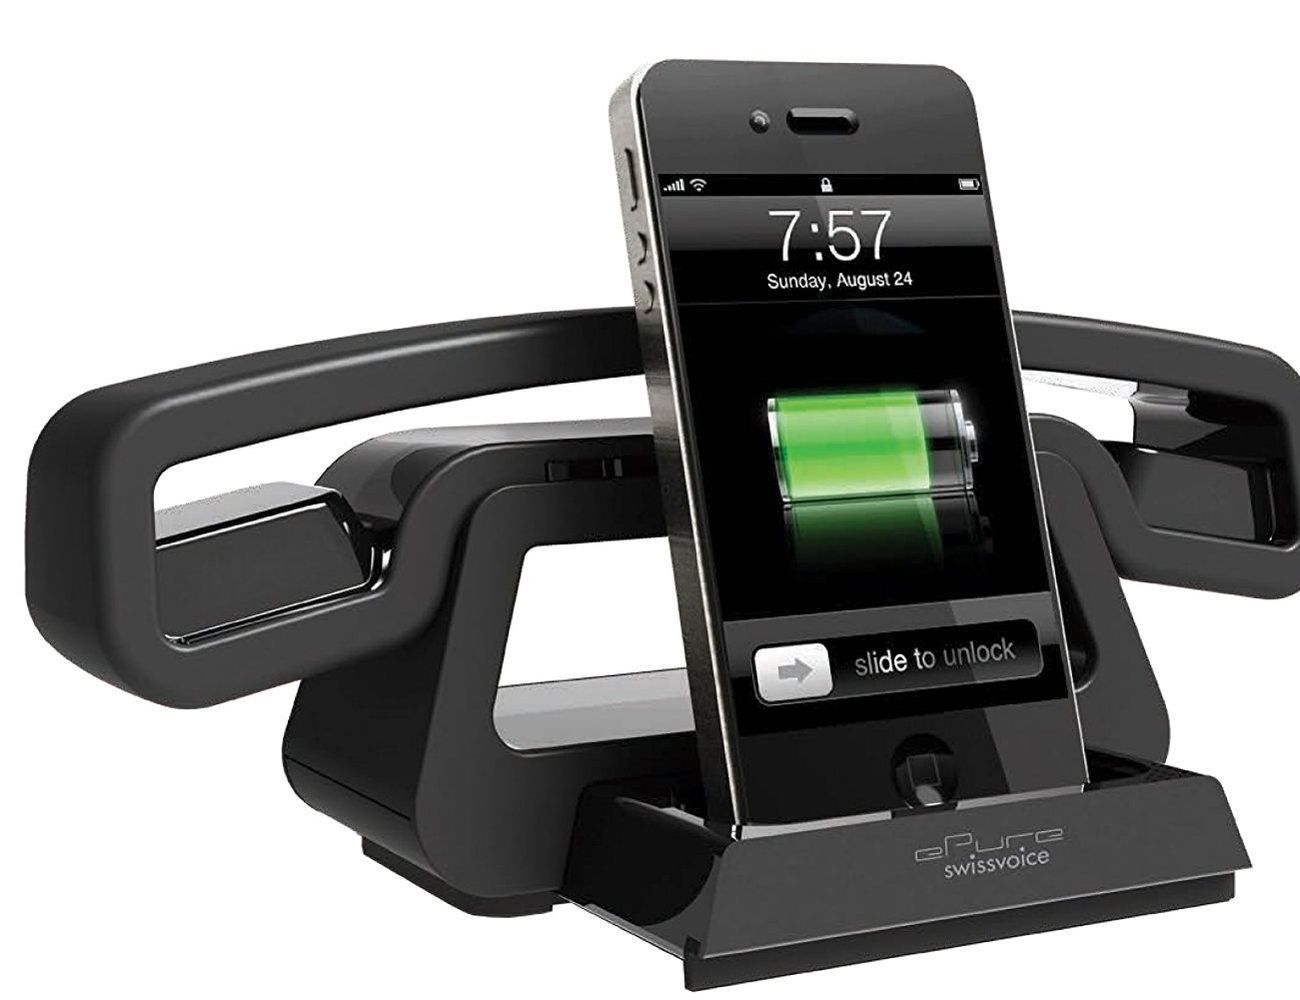 ePure Bluetooth Handset and Speakerphone for Smartphones